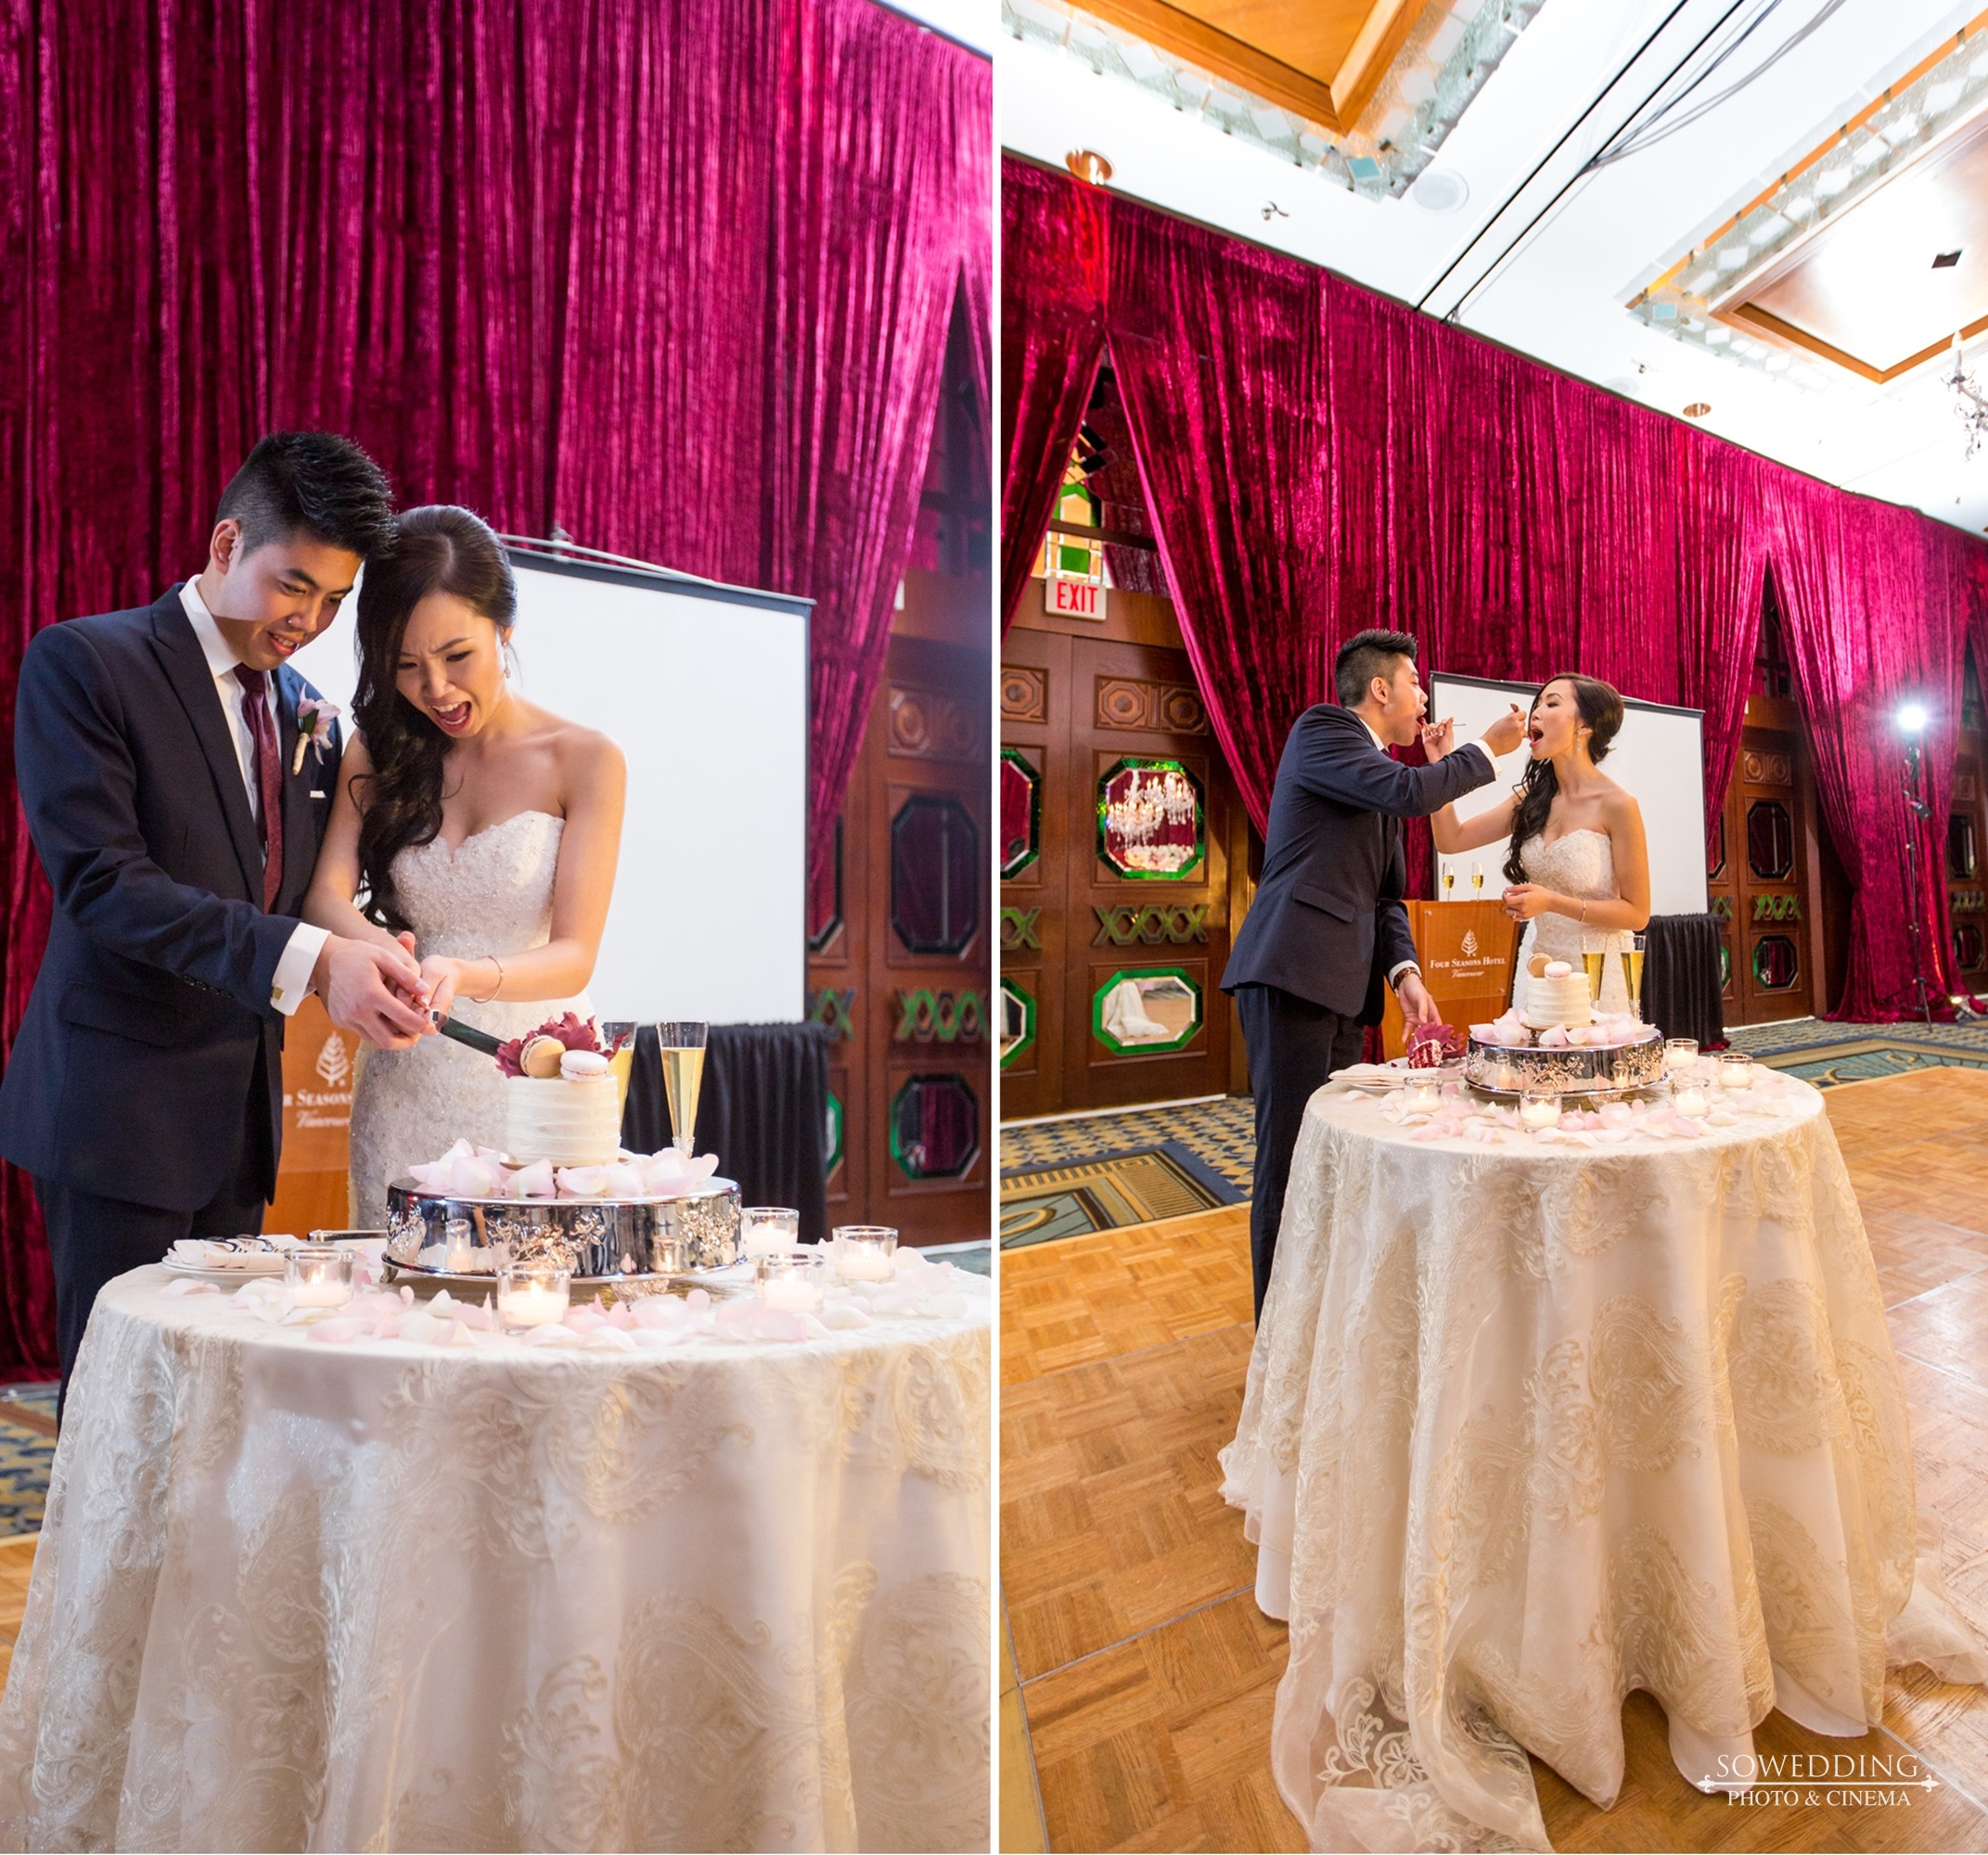 2016Mar26-Priscilla&Michael-wedding-HL-SD-0289